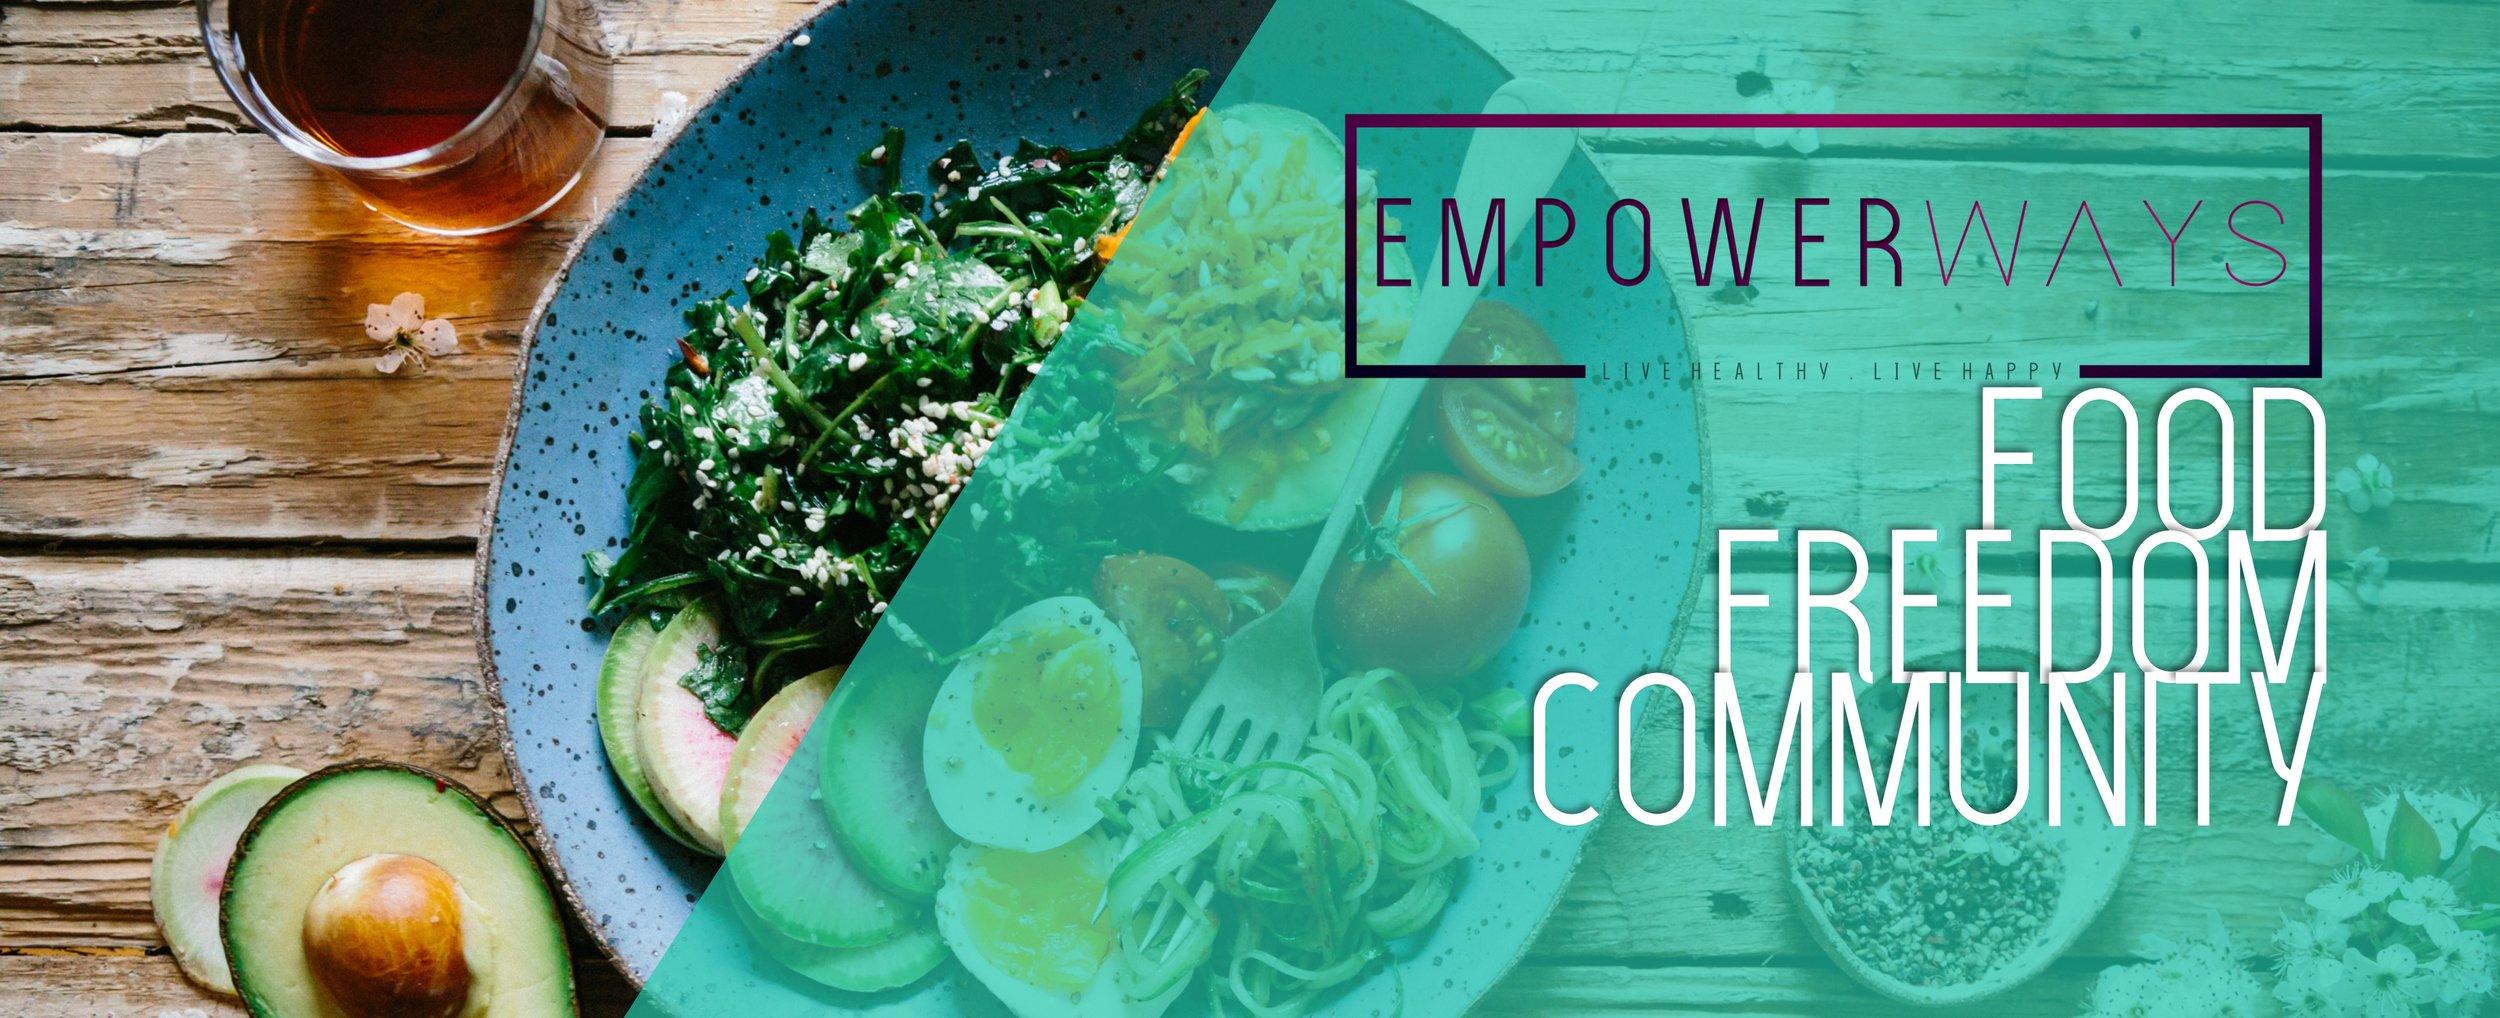 food freedom community.jpg